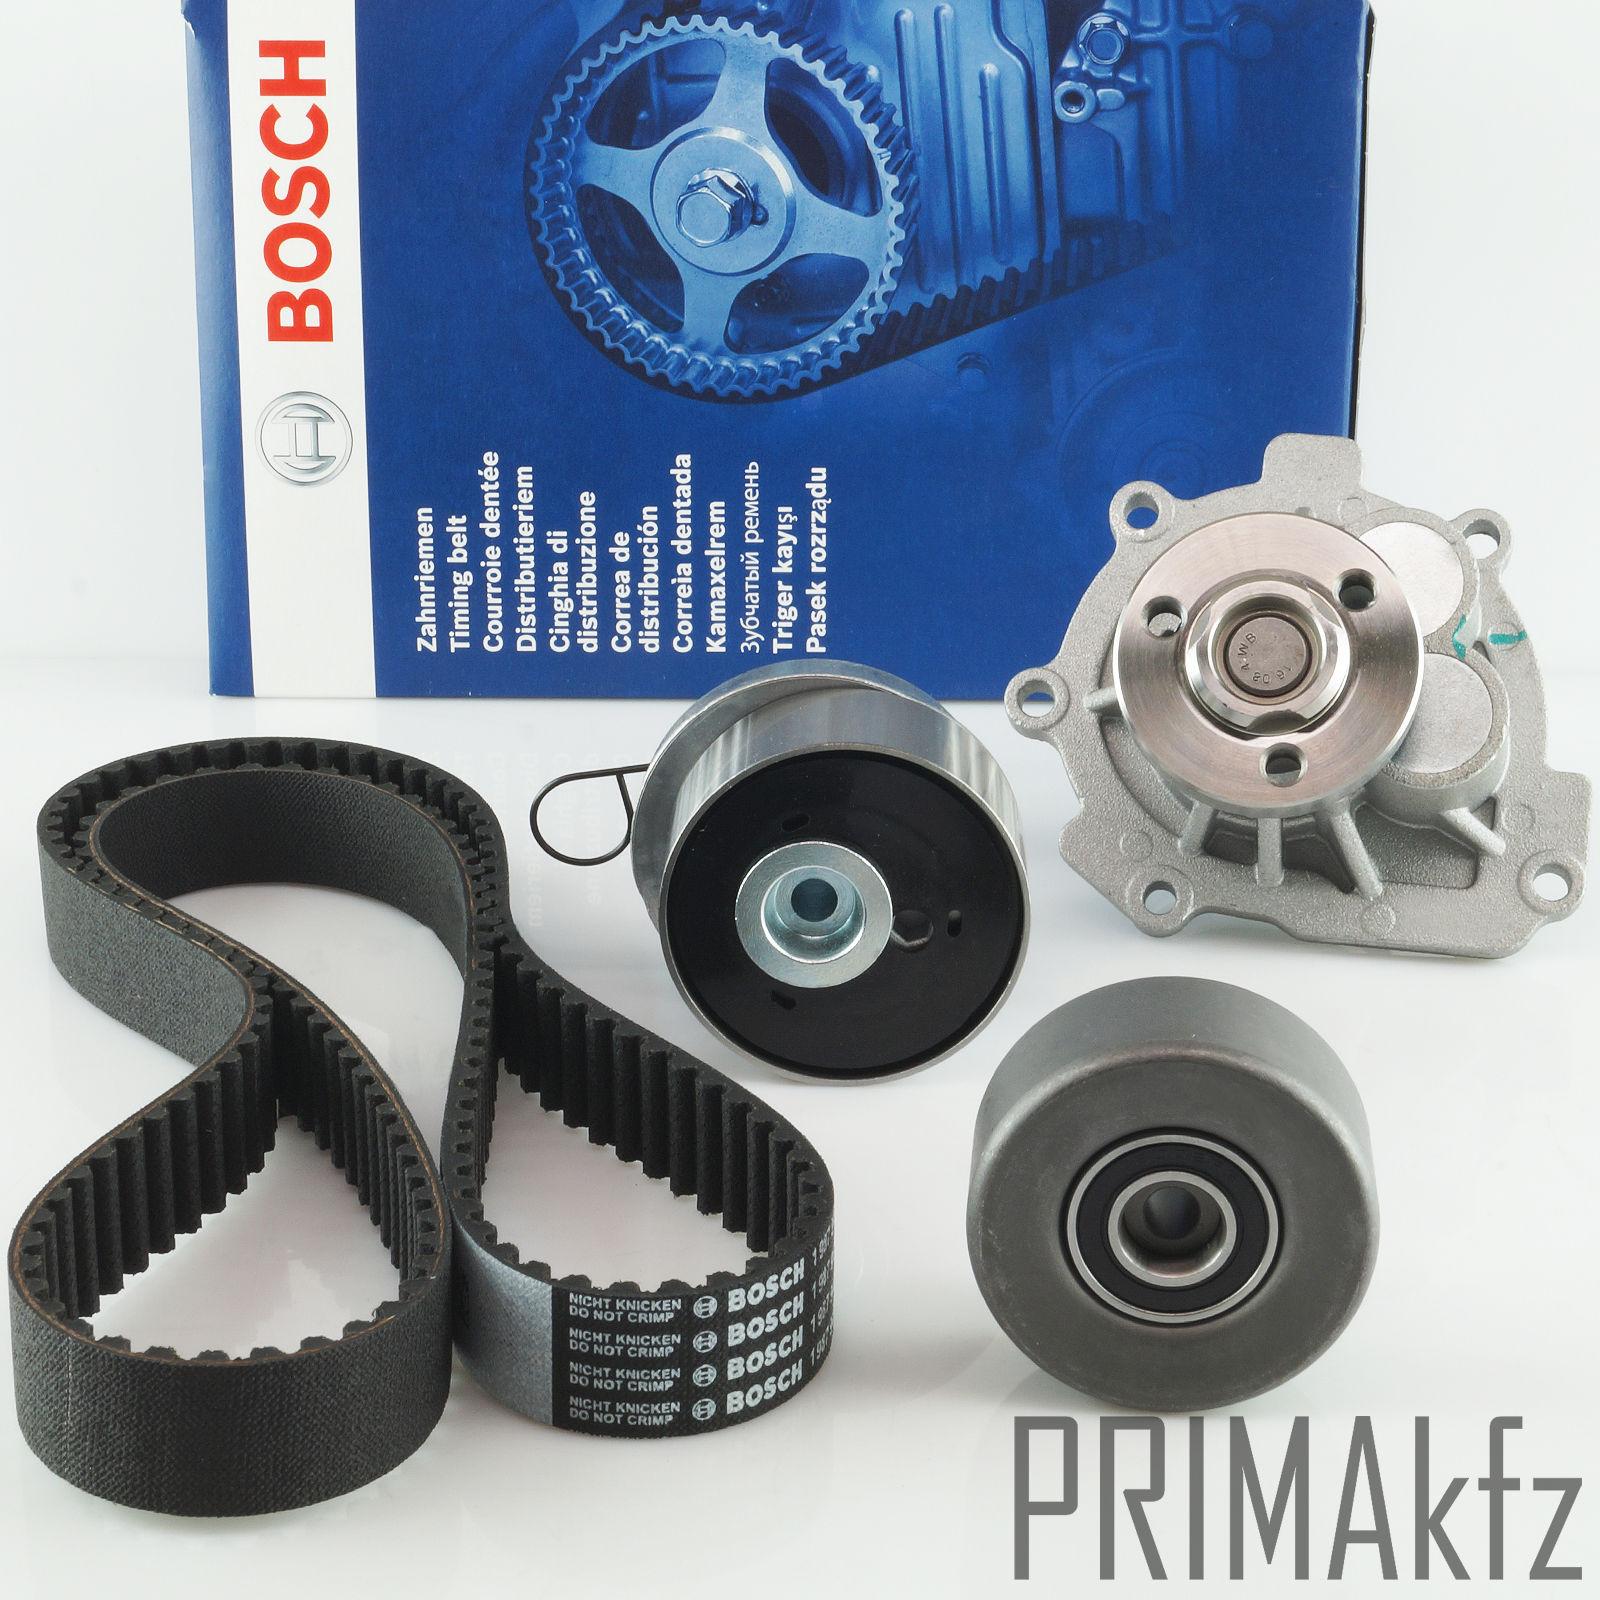 Rollensatz GATES 5603XS Zahnriemen Wasserpumpe Opel 1.6 1.8 16V